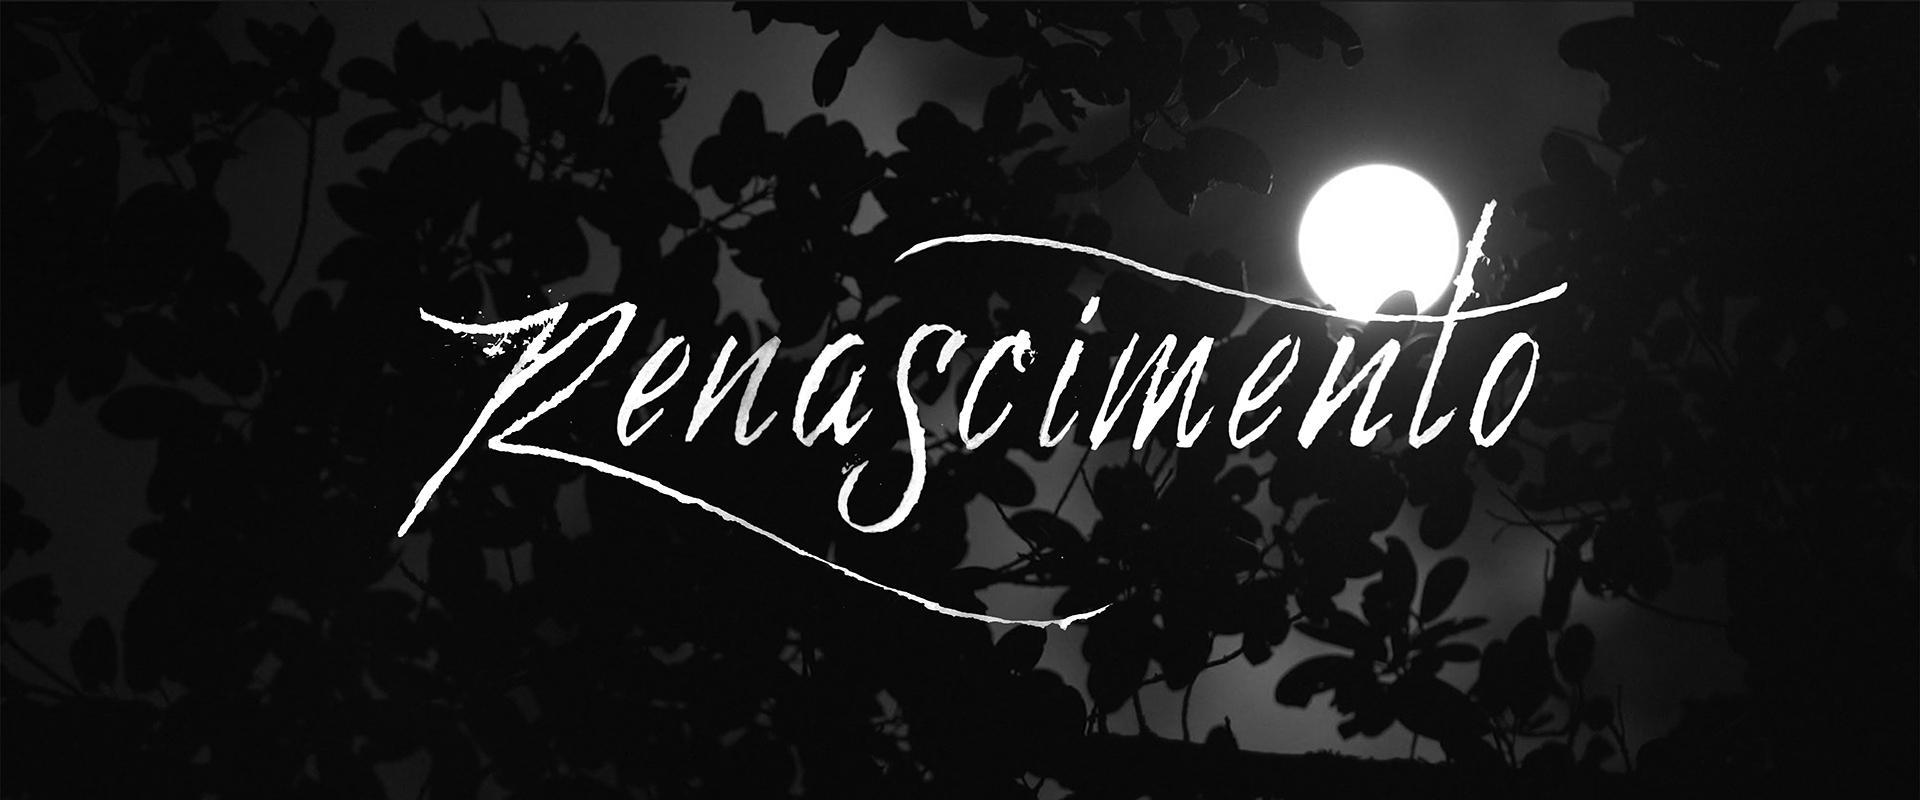 01 Renascimento.jpg